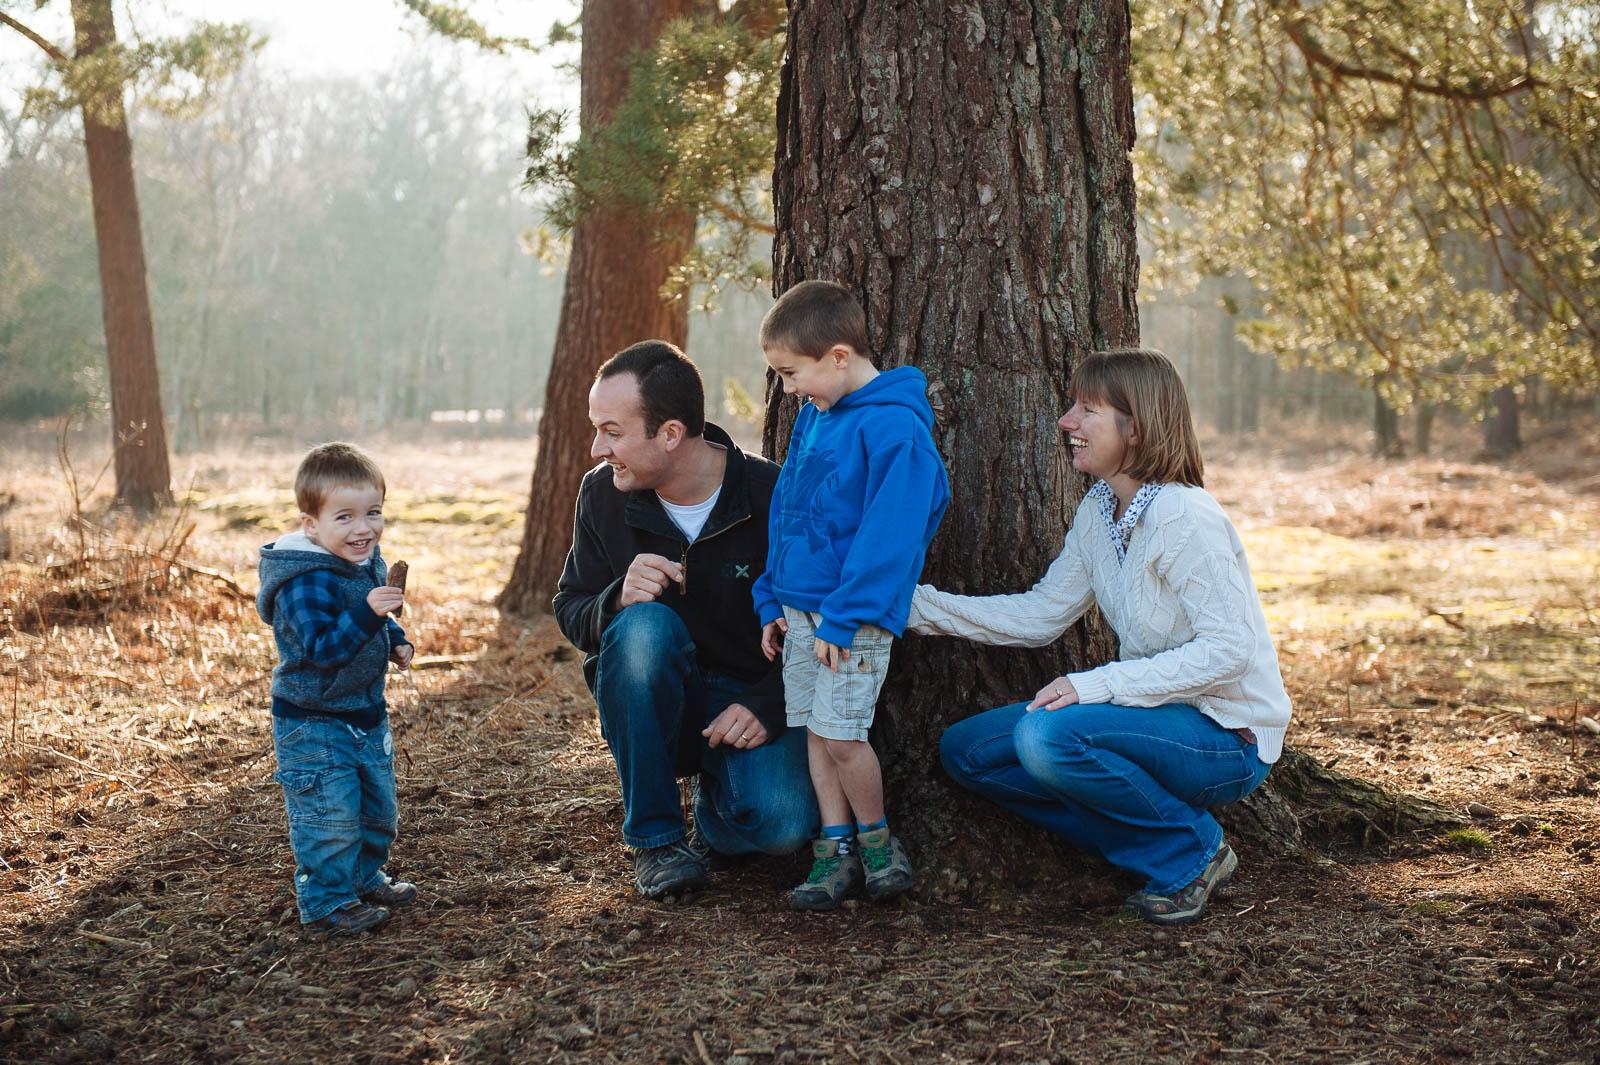 Pulborough-family-photography-003